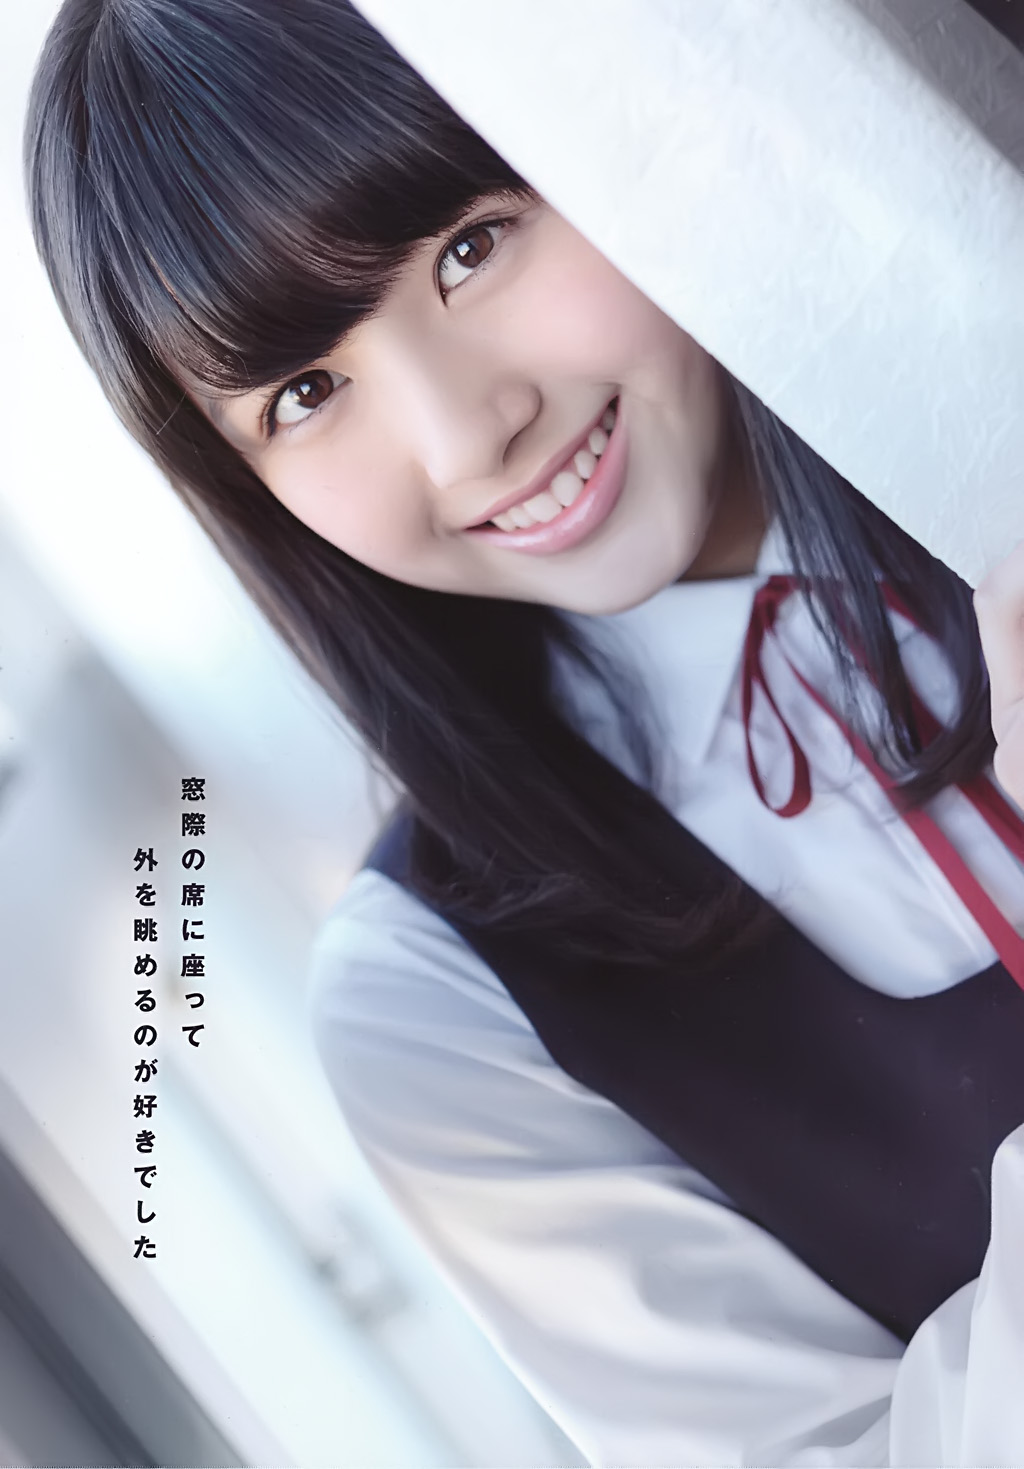 Owada Nana 大和田南那 AKB48, PhotoBook 写真集 Graduation 中学卒業 2015 Gravure